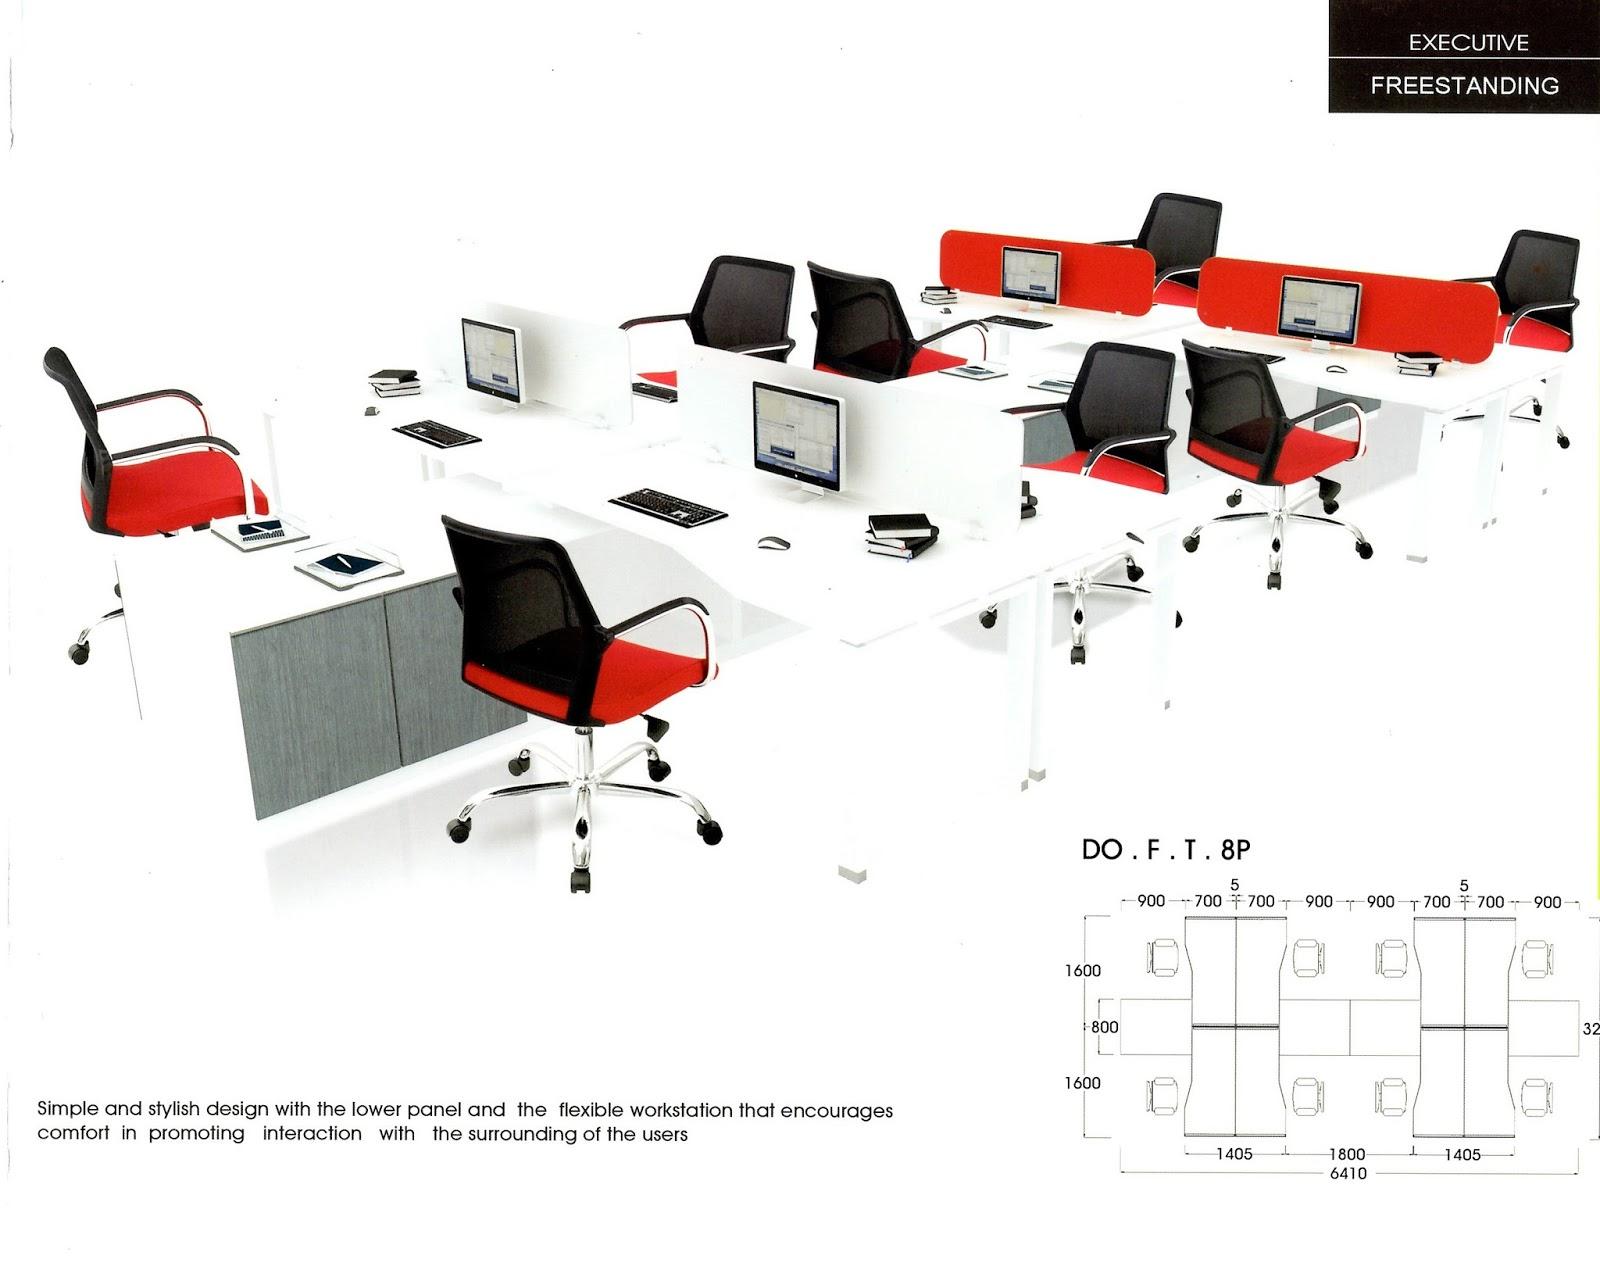 office chair in surat cheap papasan chairs for sale donati furniture